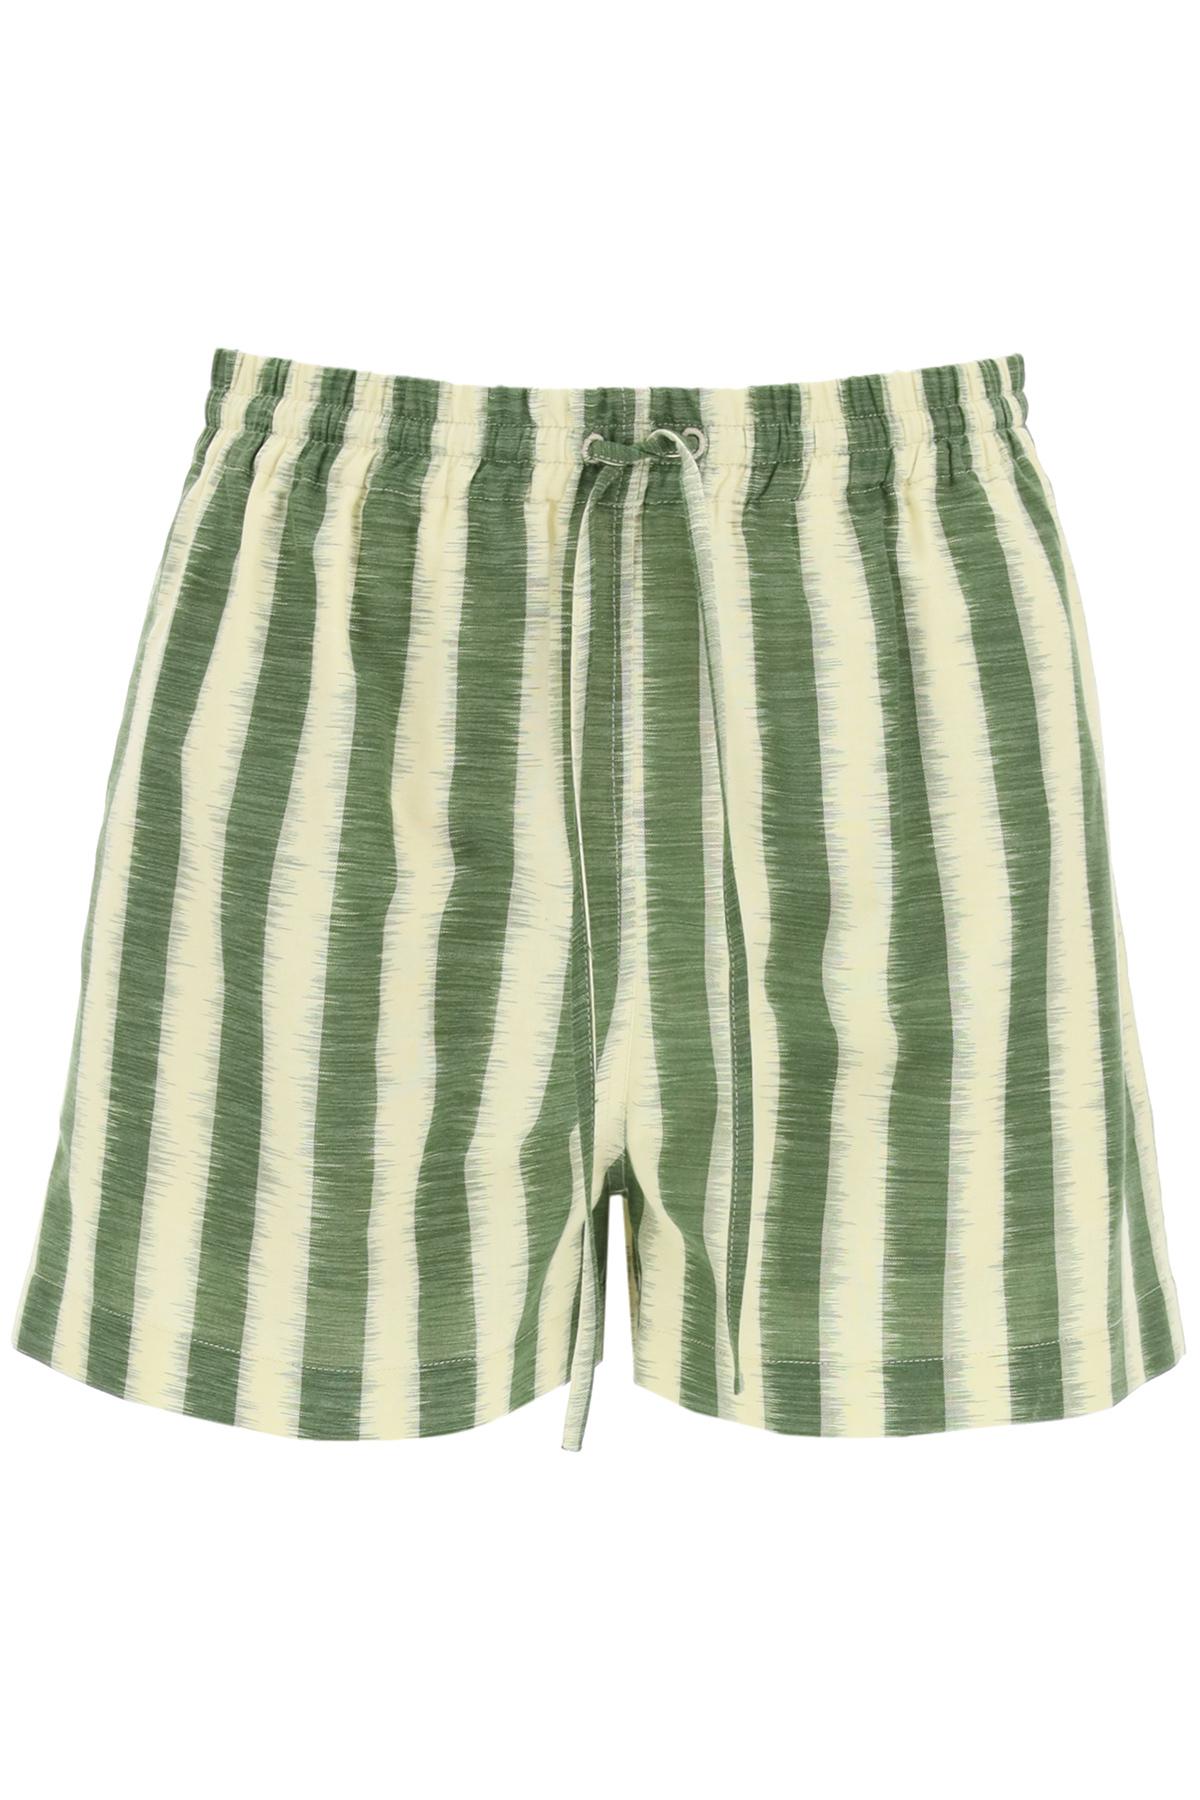 Dior shorts d-stripes